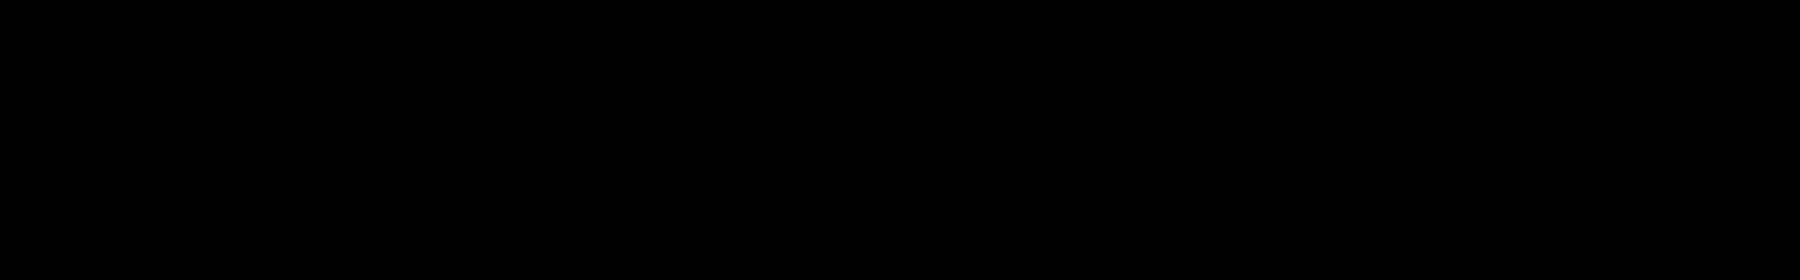 Illusion - Organic Downtempo audio waveform